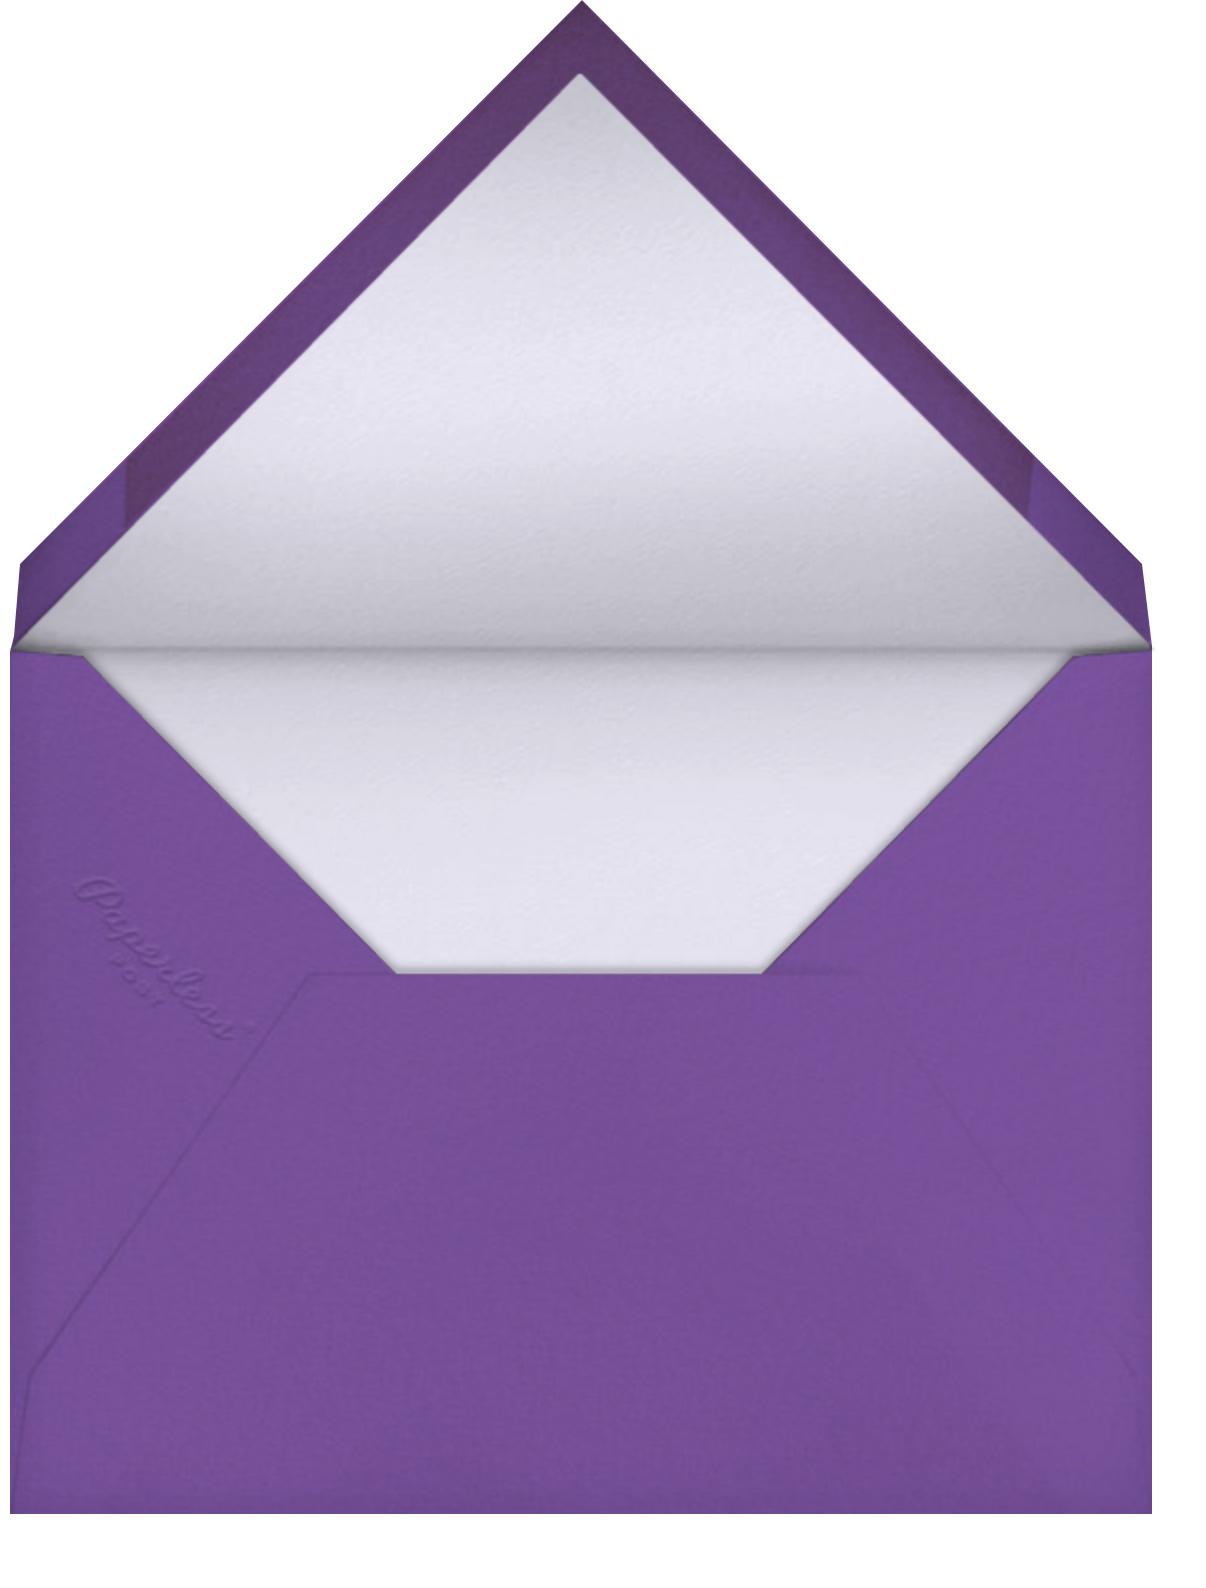 Purple Pansies - Anthropologie - Thinking of you - envelope back